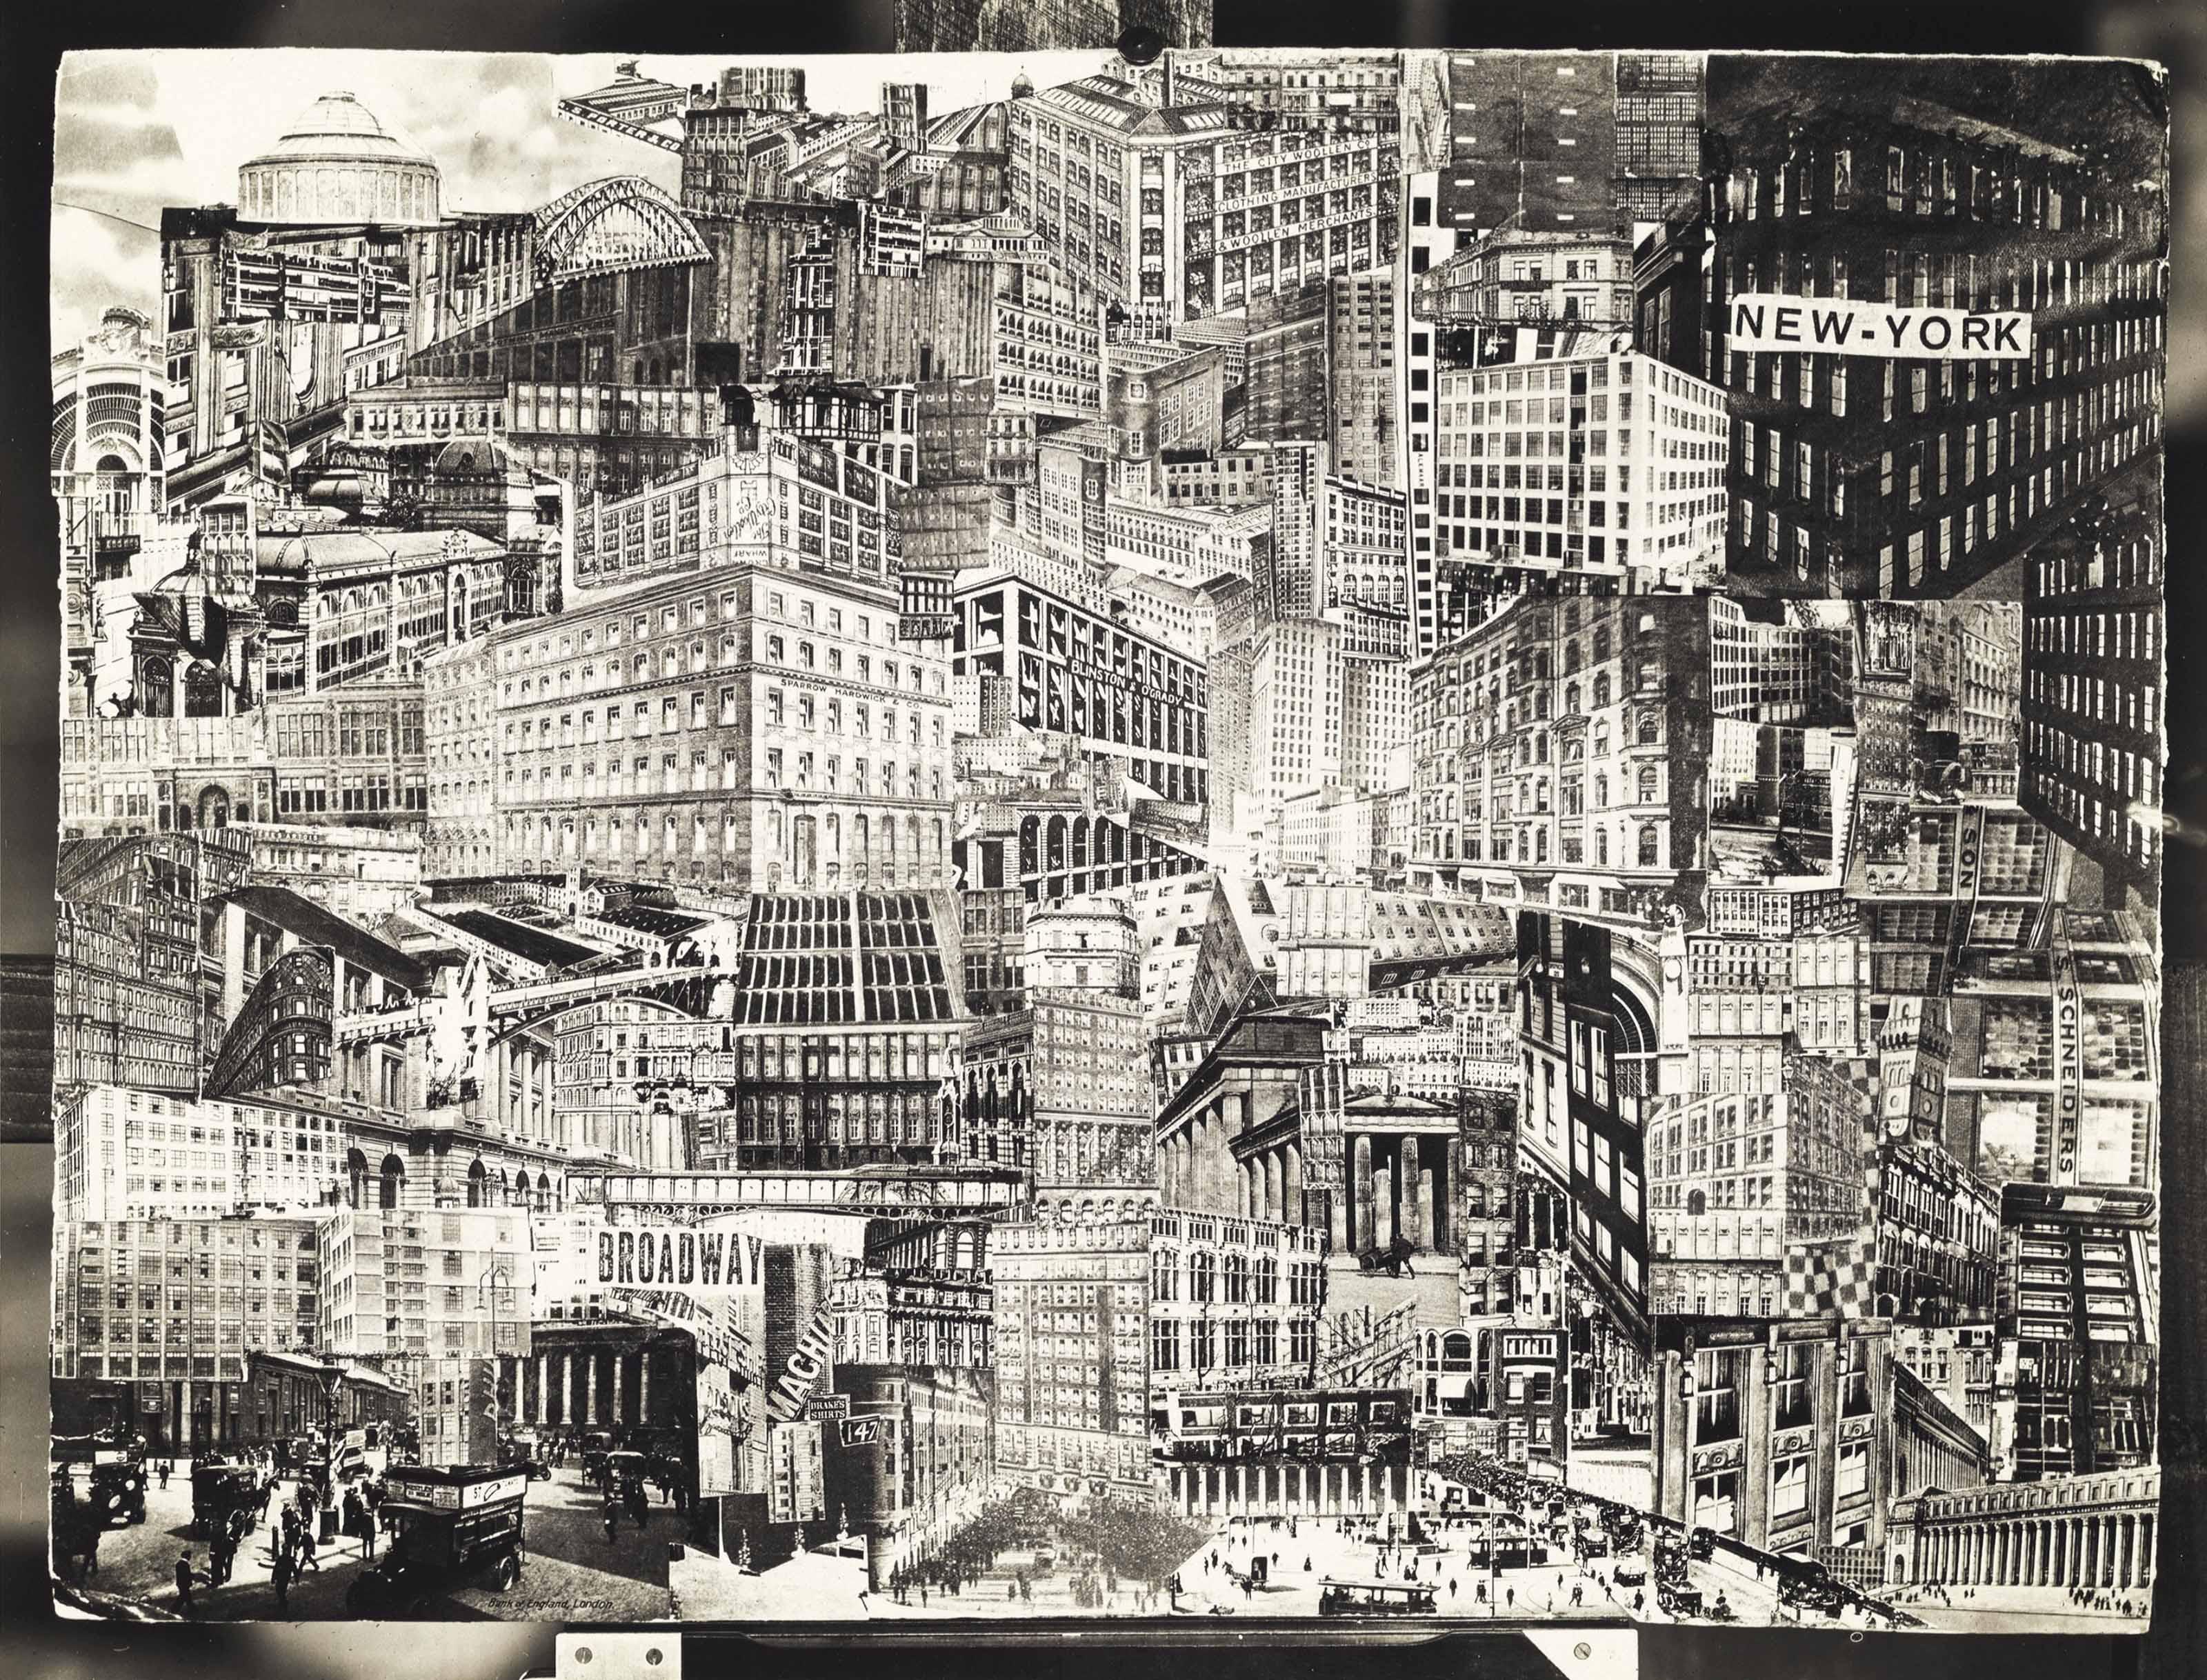 New York, 1919